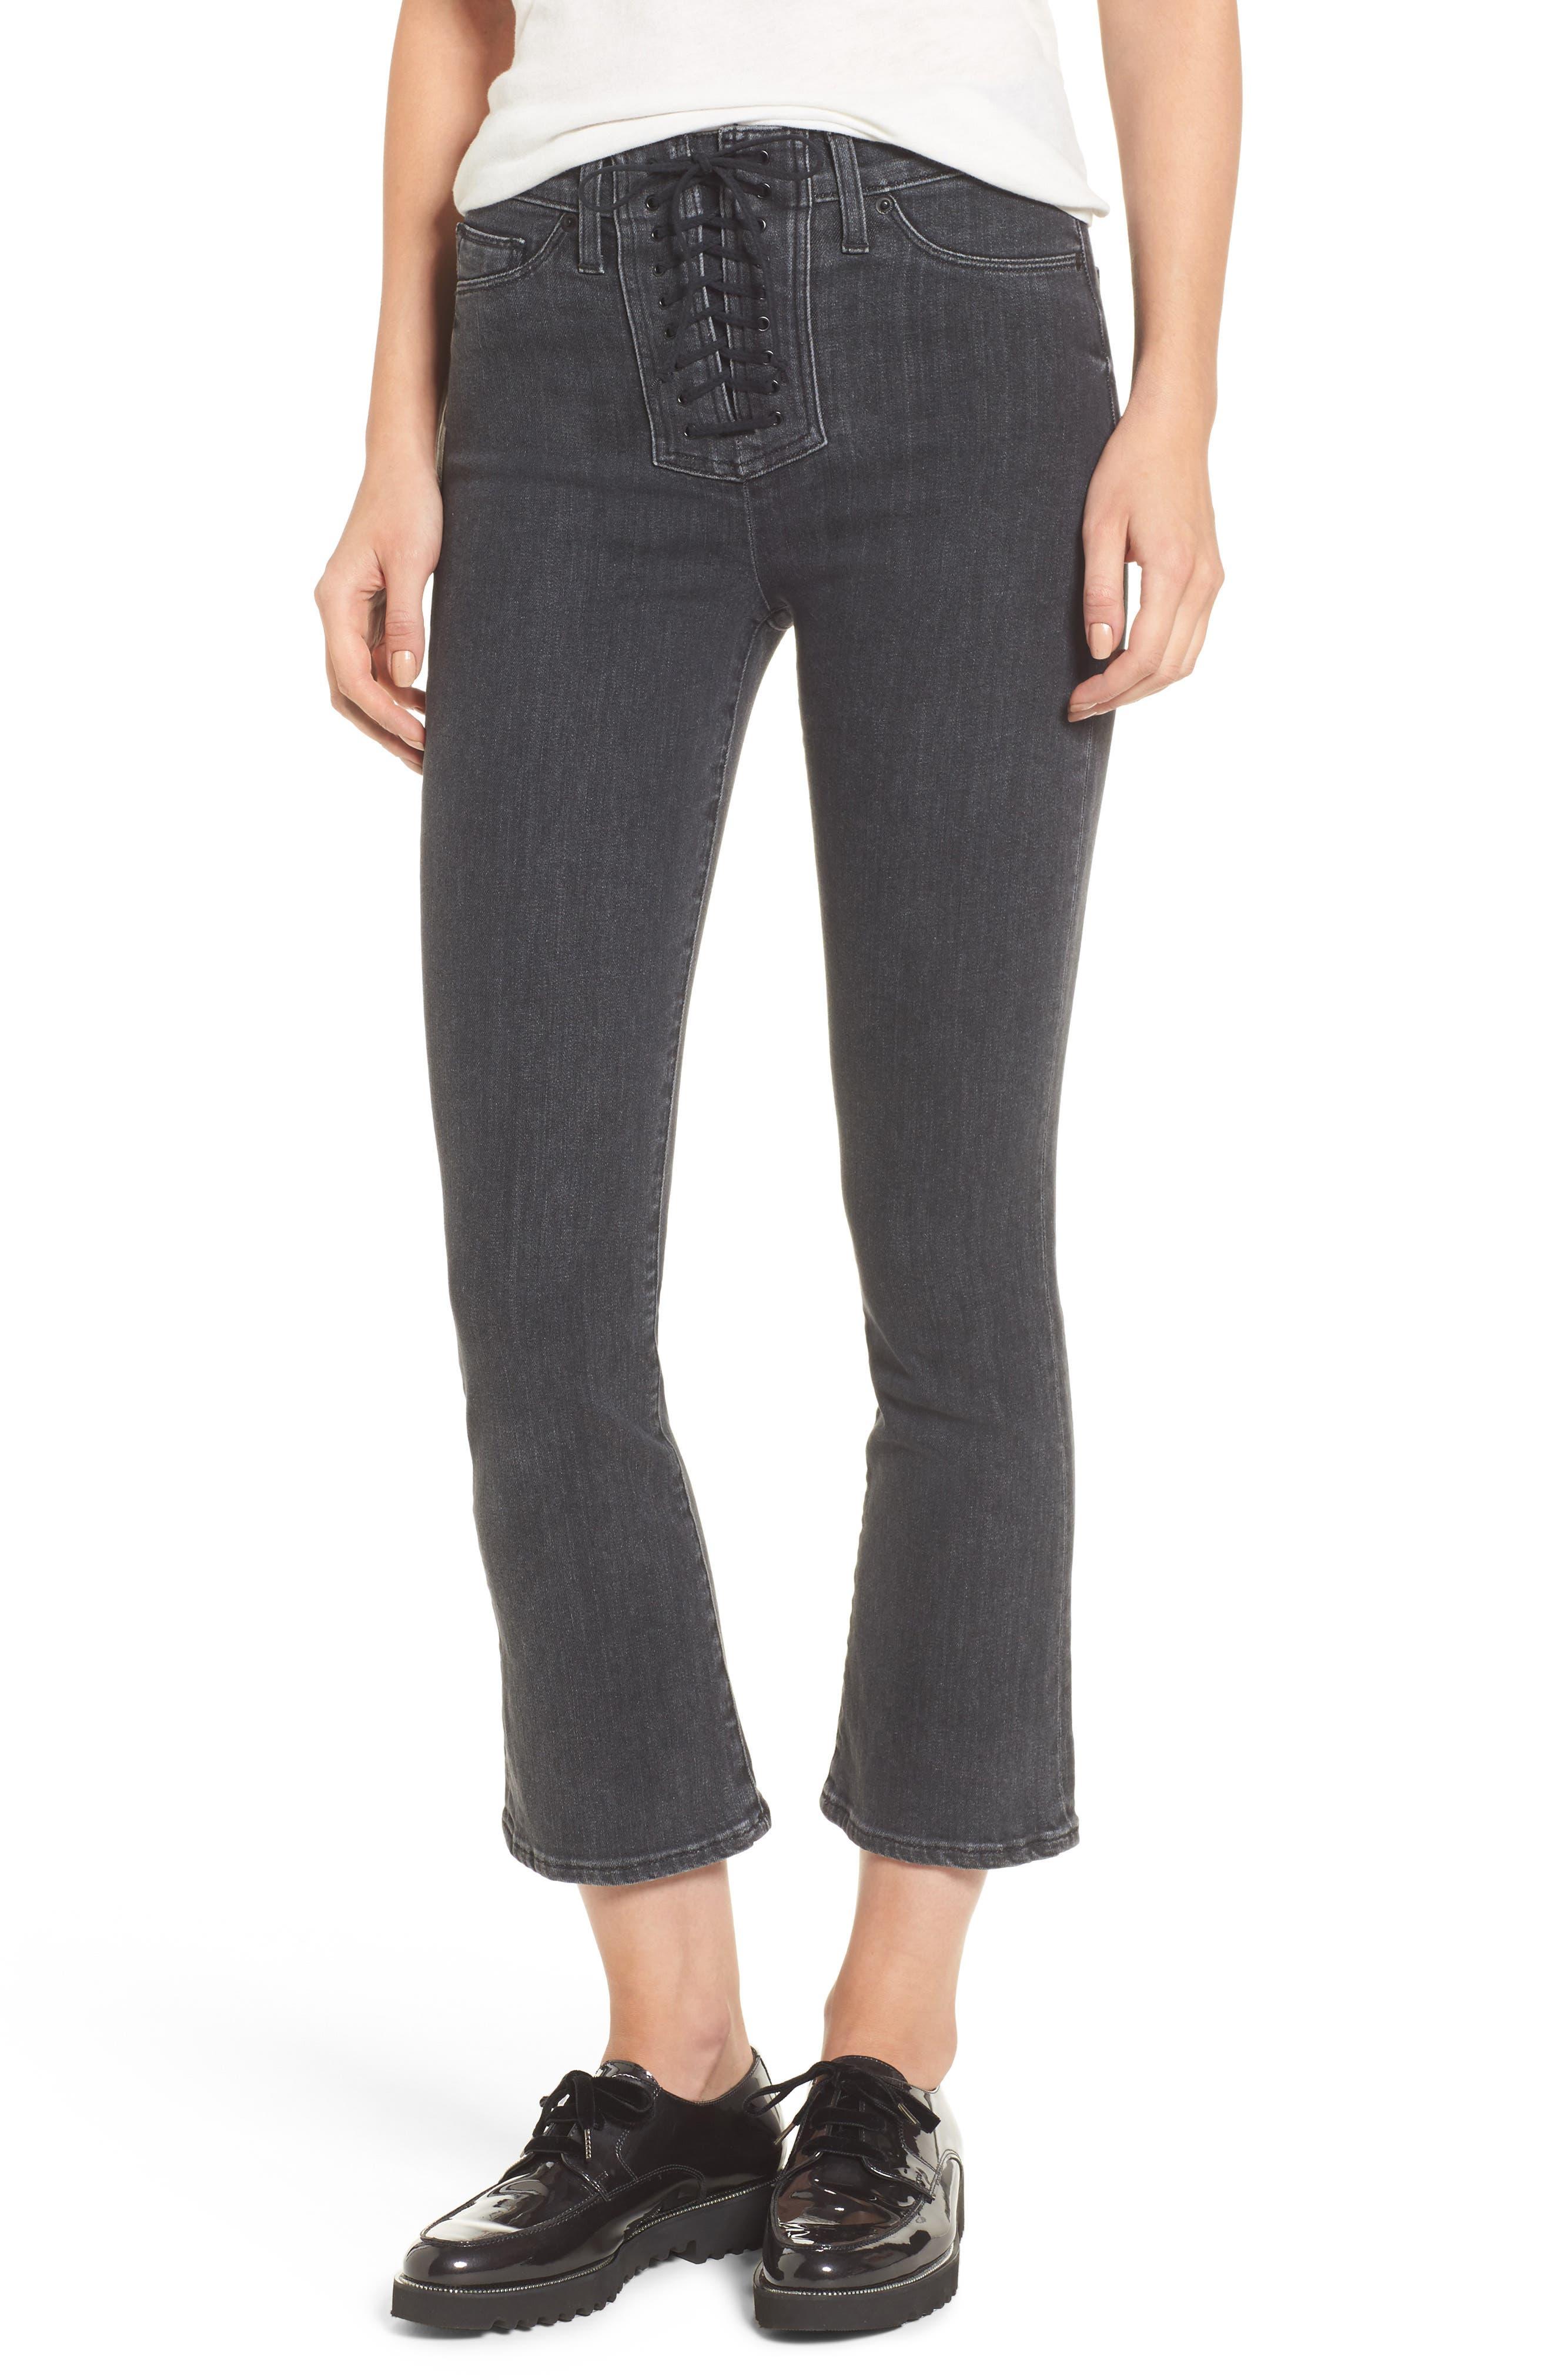 Bullocks High Waist Lace-Up Crop Jeans,                         Main,                         color, Disarm